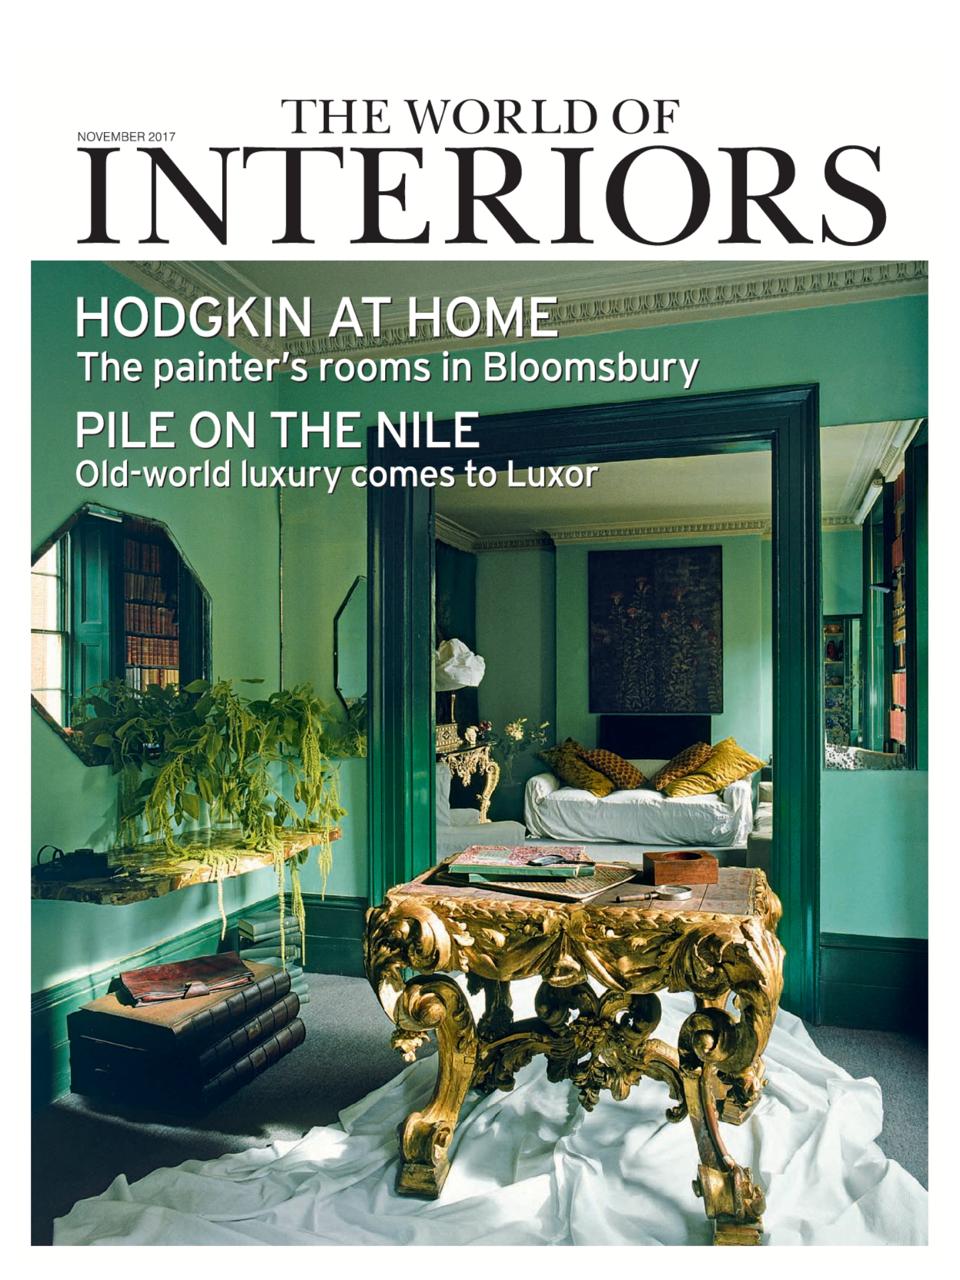 World of Interiors - November 2017